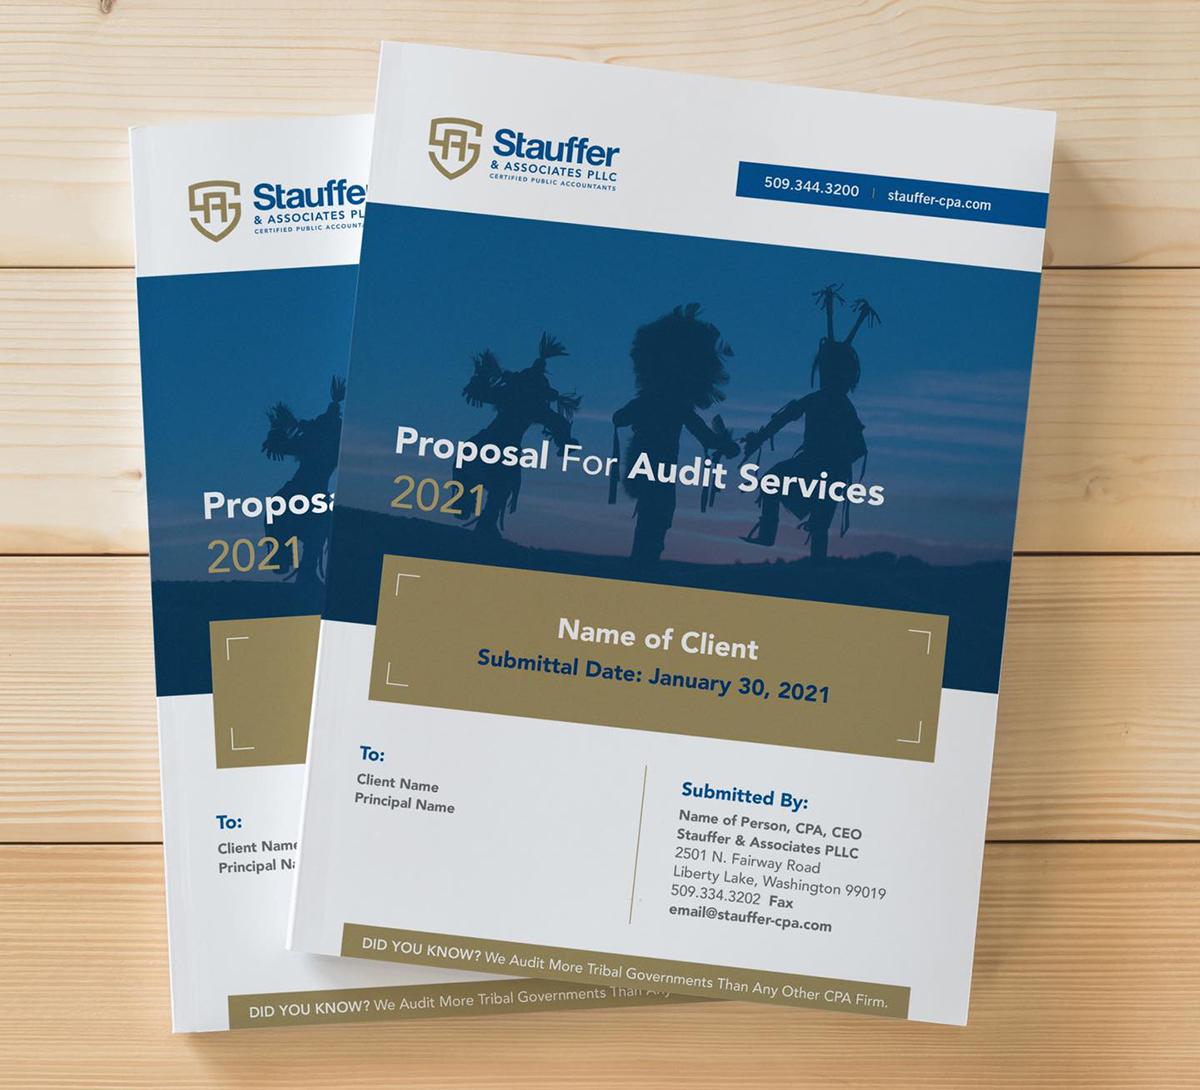 Stauffer & Associates brochure design by tran creative